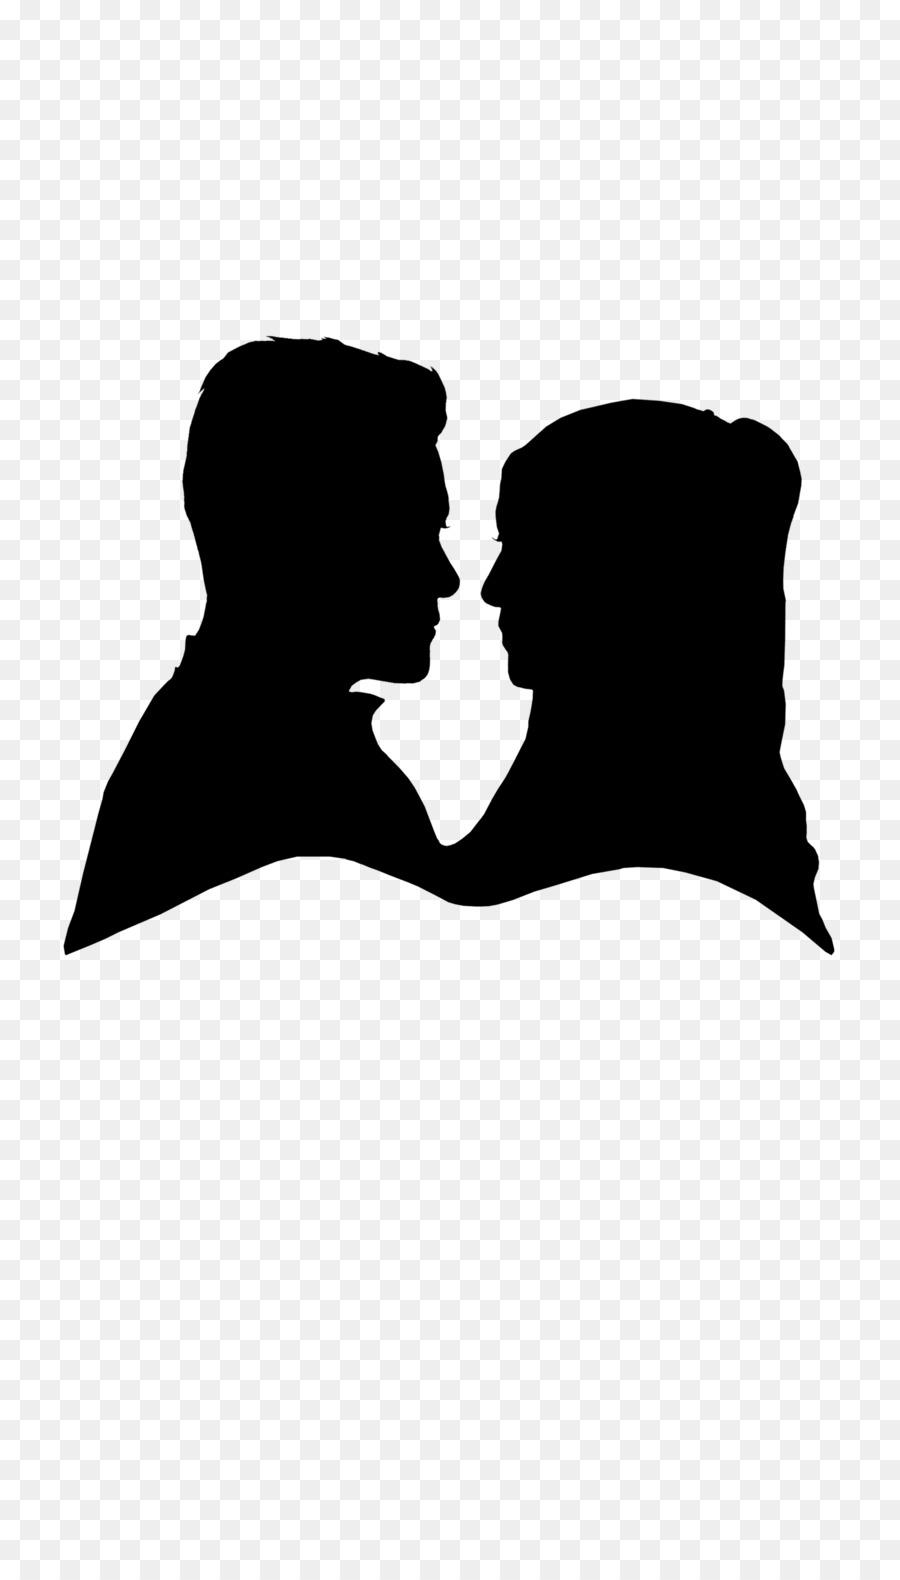 900x1580 Wedding Invitation Silhouette